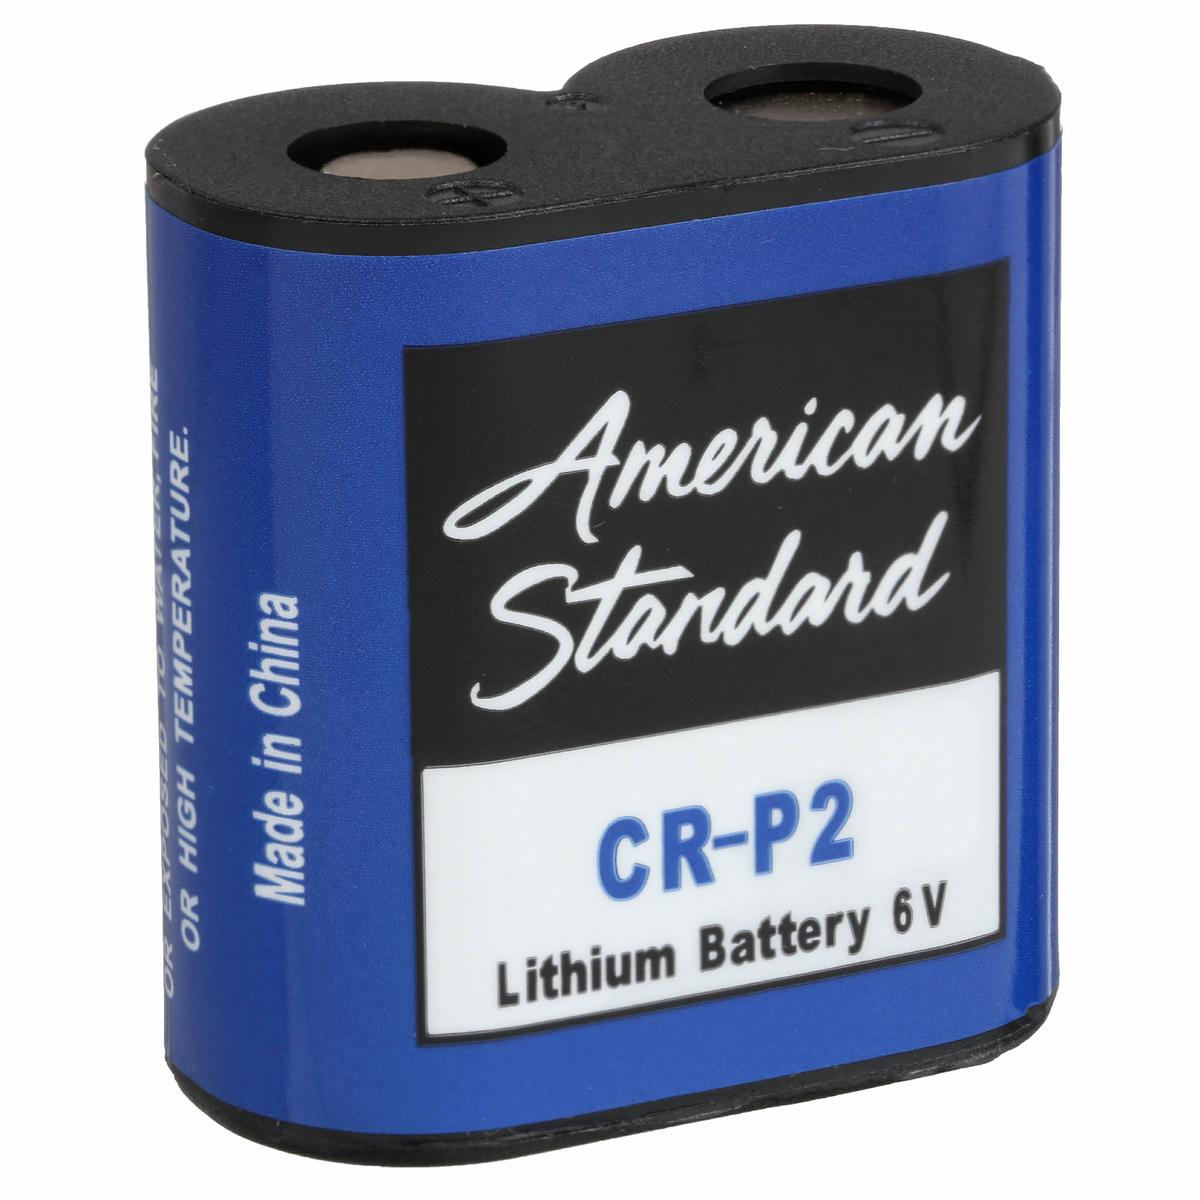 American Standard Bathroom Faucet: Battery - Gamut